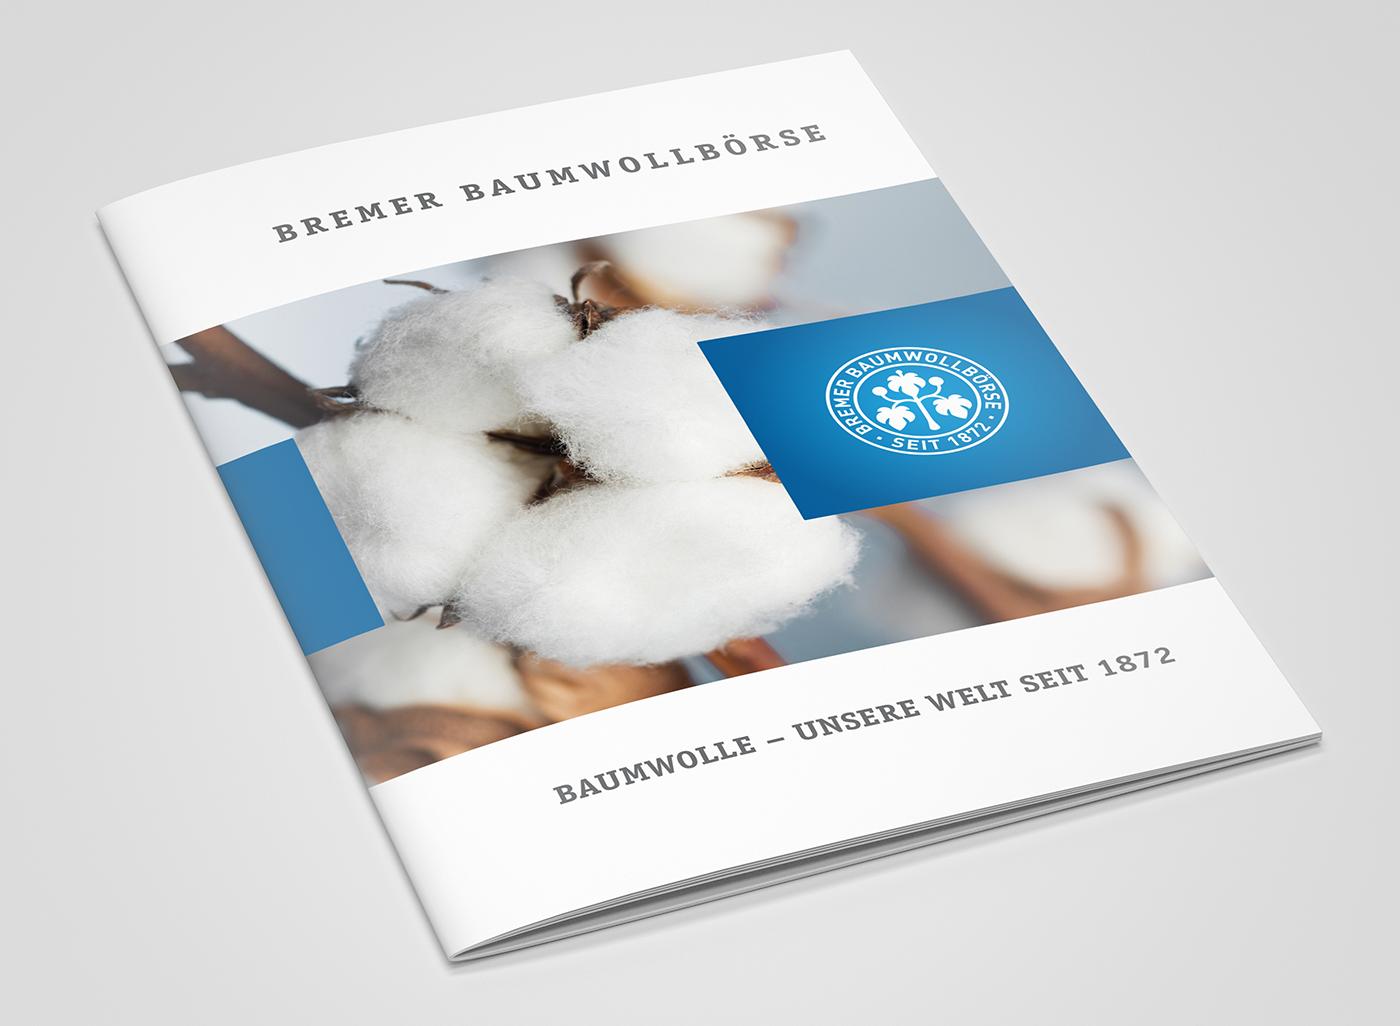 eskalade Baumwollbörse Broschüre